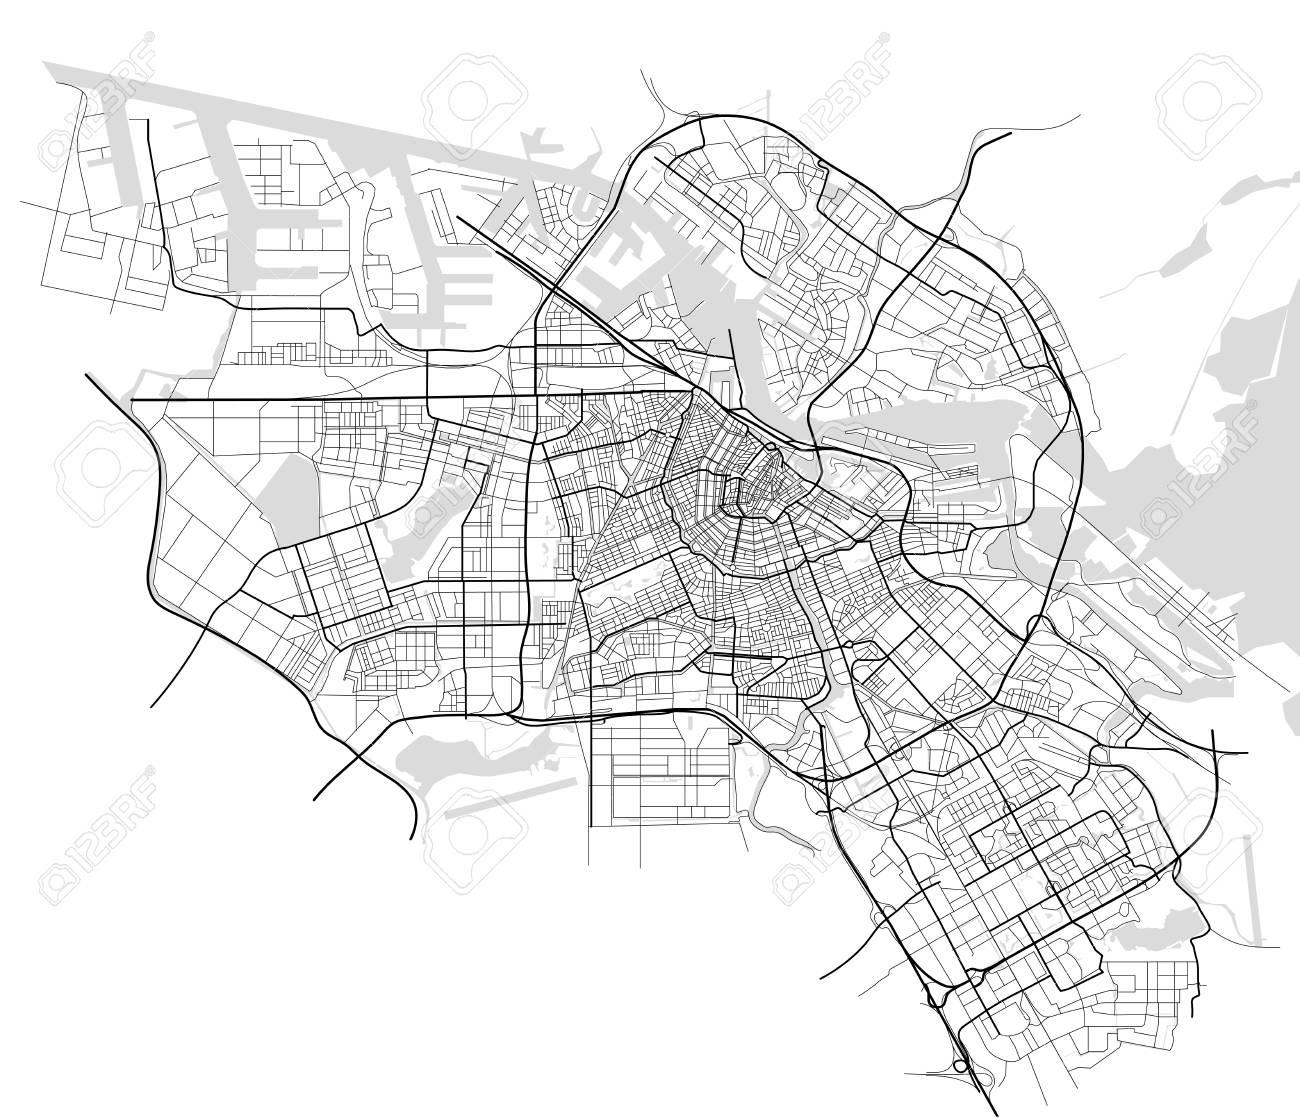 City Map of Amsterdam, Netherlands - 85116715